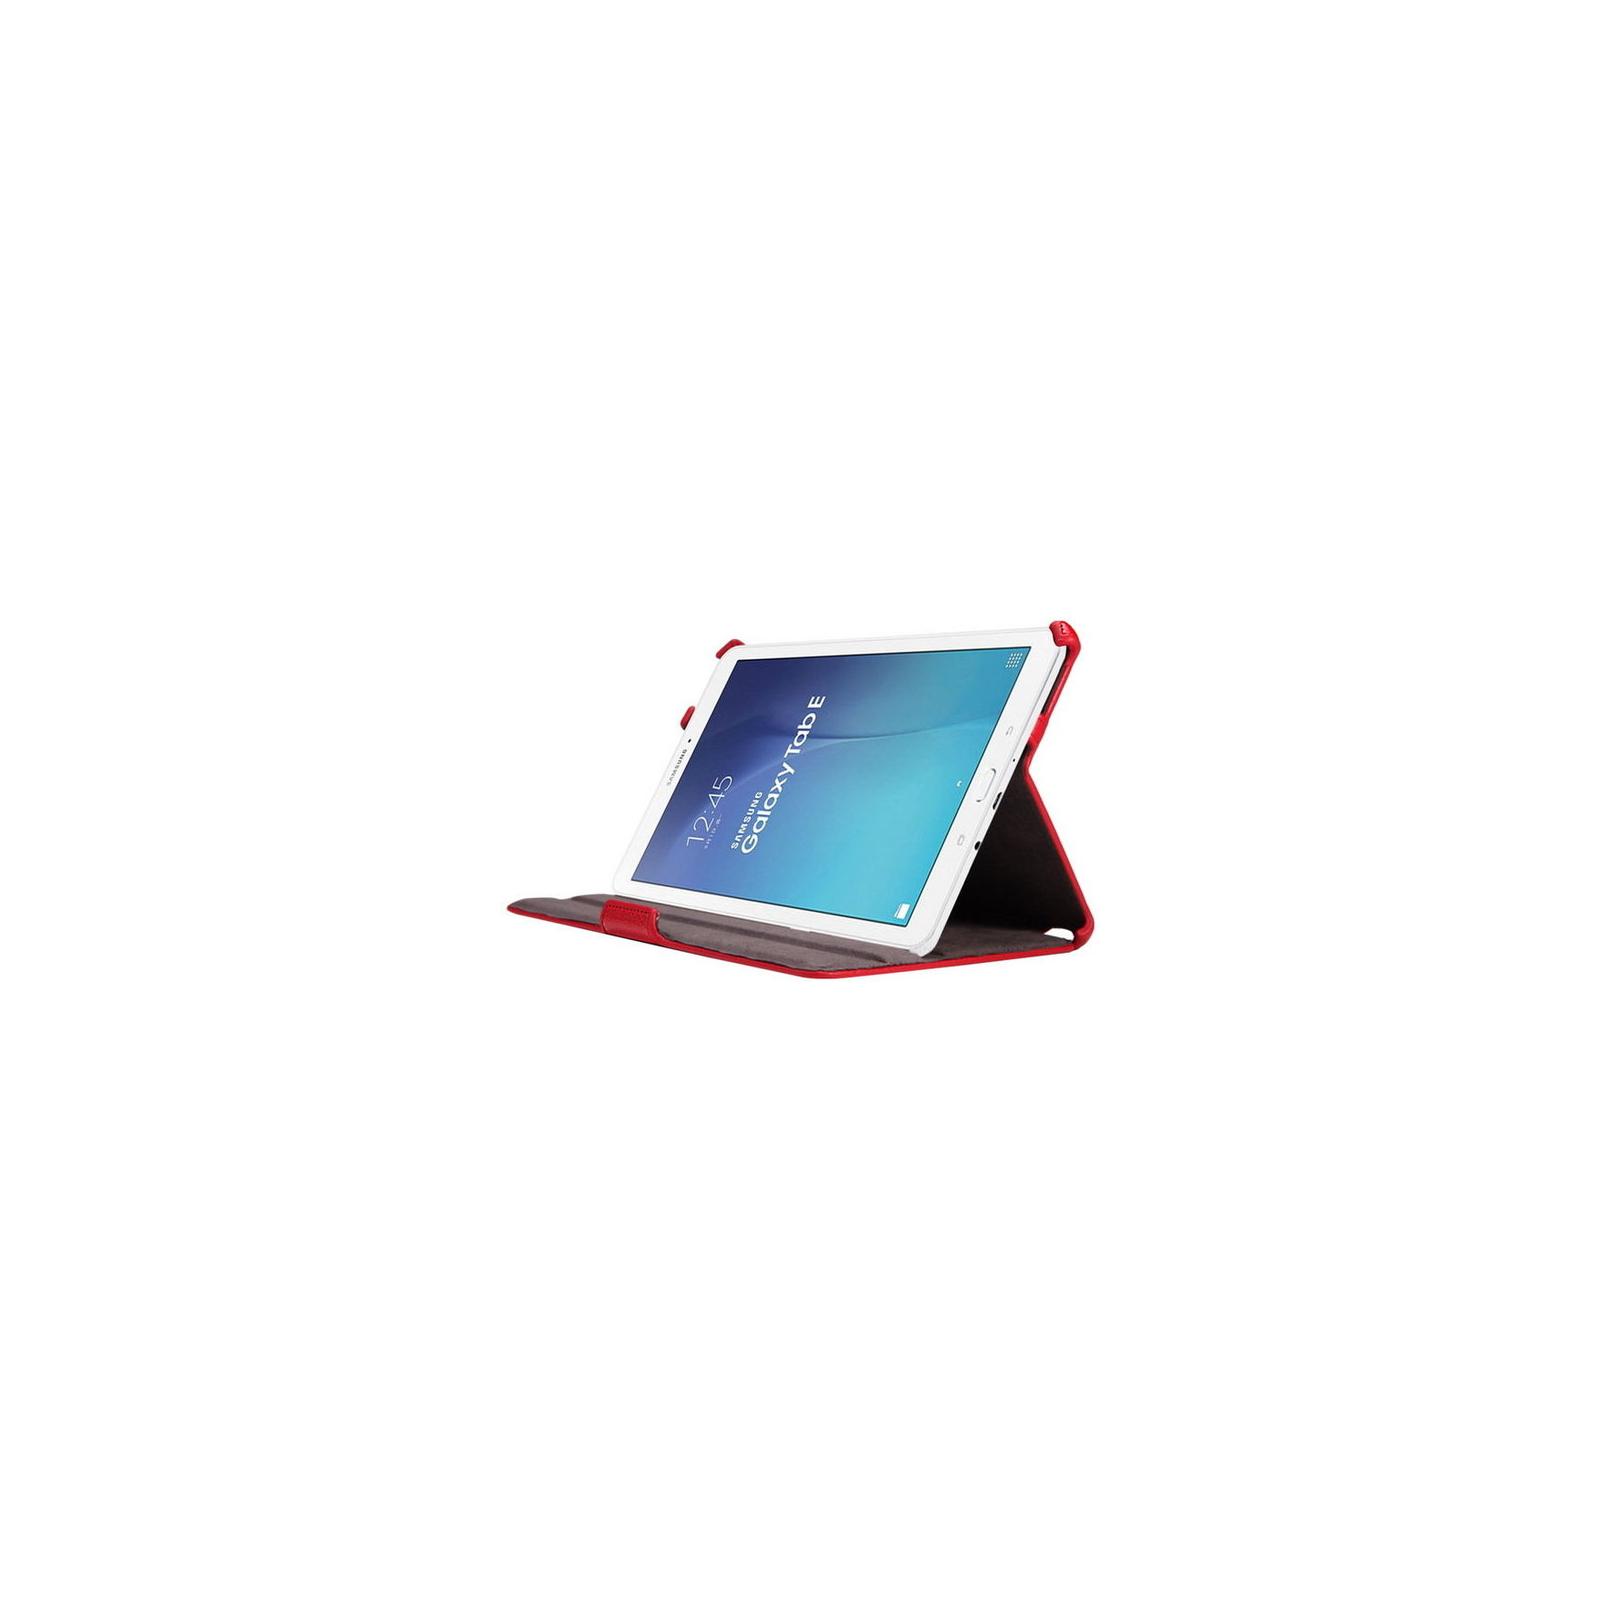 Чехол для планшета AirOn для Samsung Galaxy Tab E 9.6 red (4822352777258) изображение 5